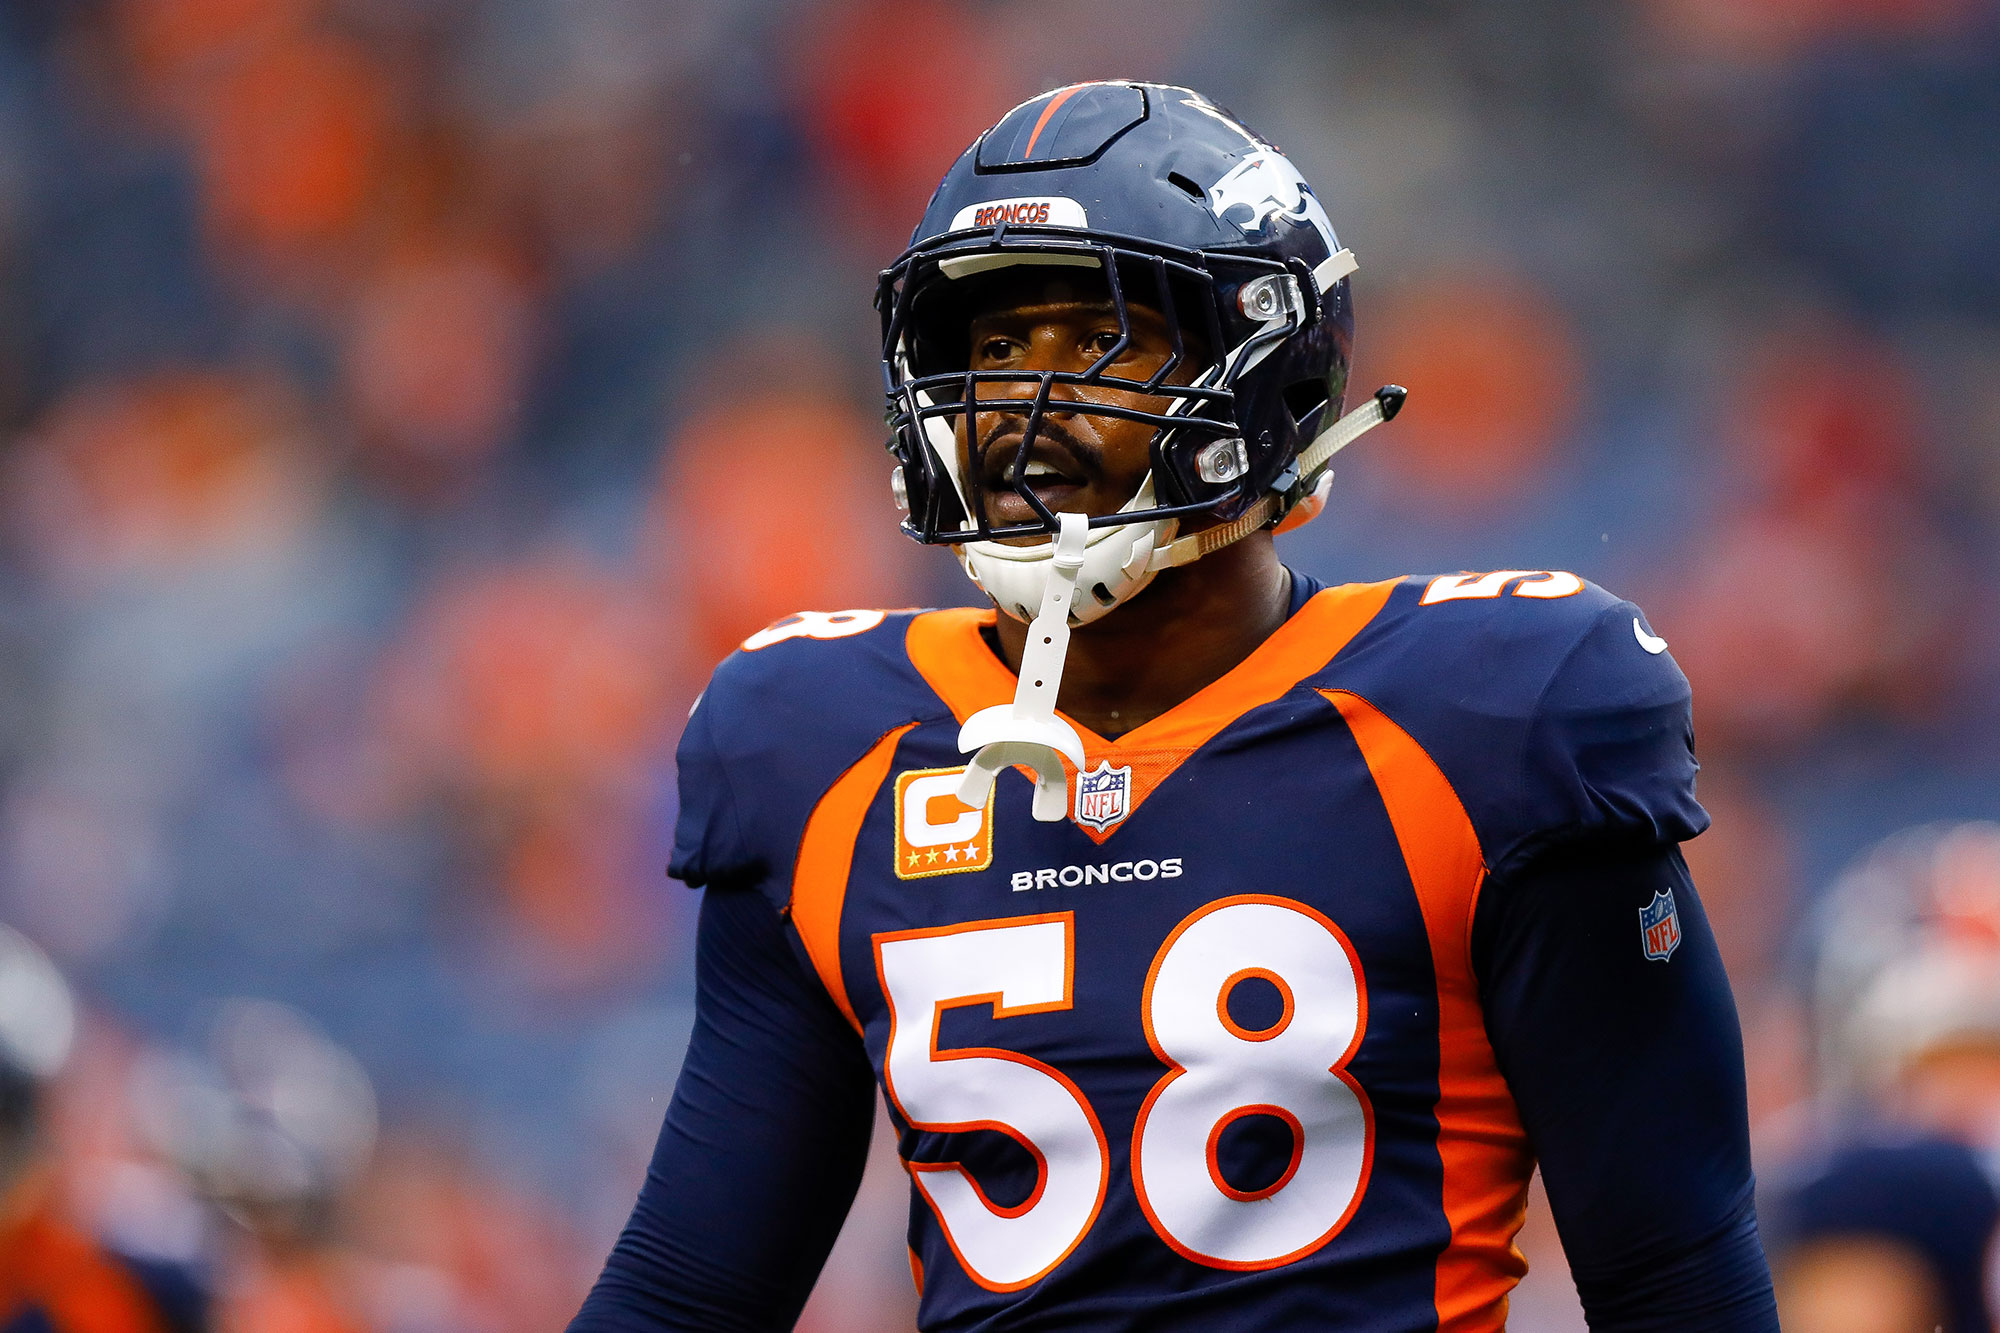 Broncos' Von Miller the subject of criminal investigation